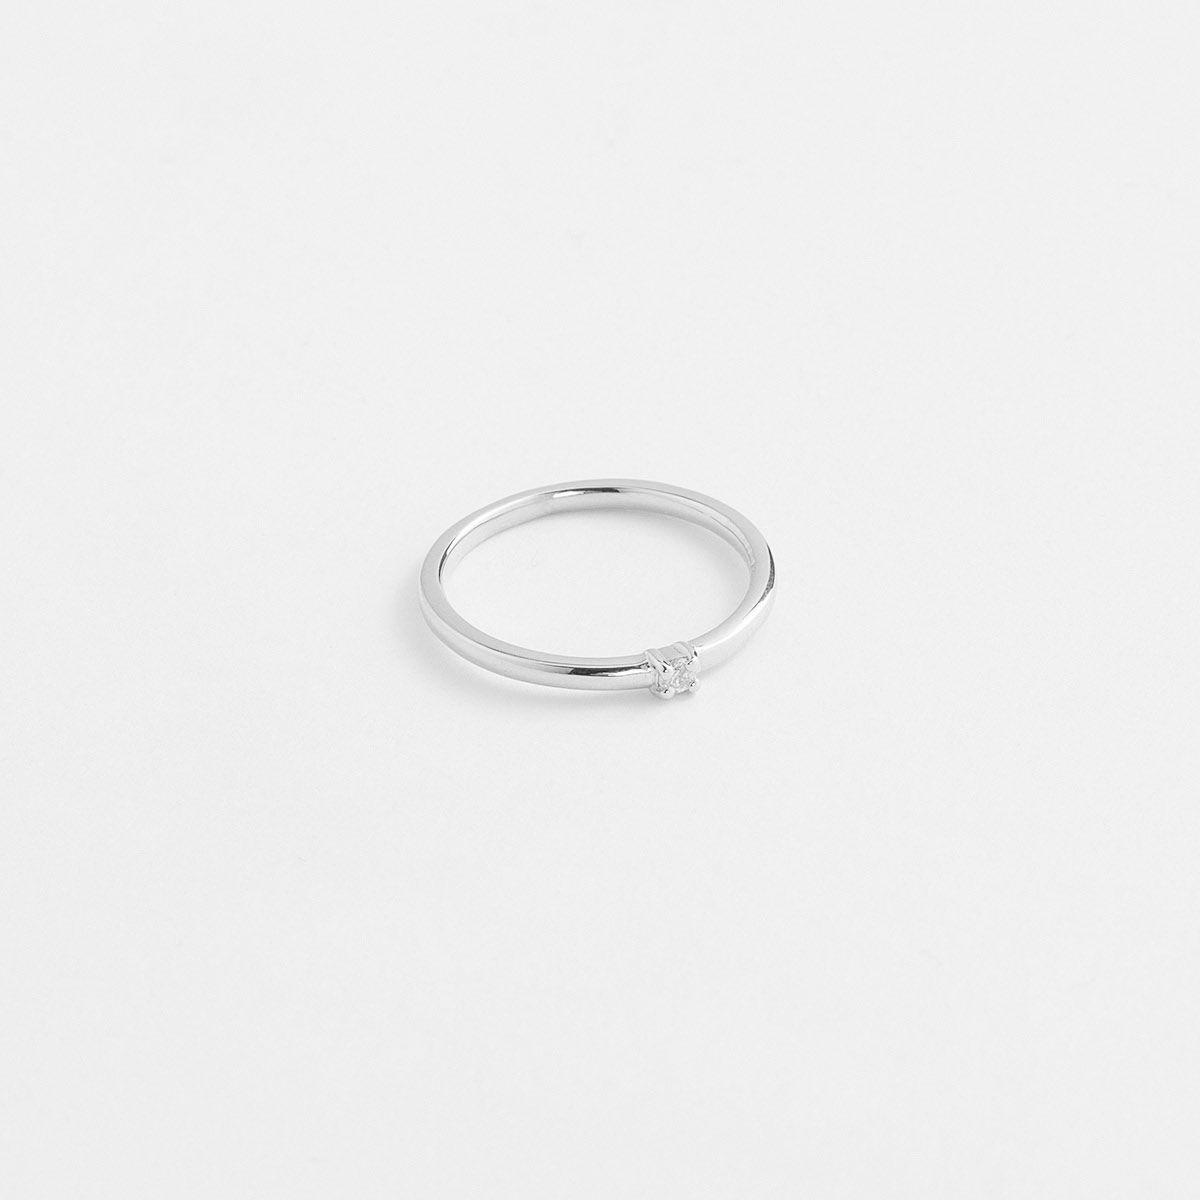 Lane - Ringe - Silber